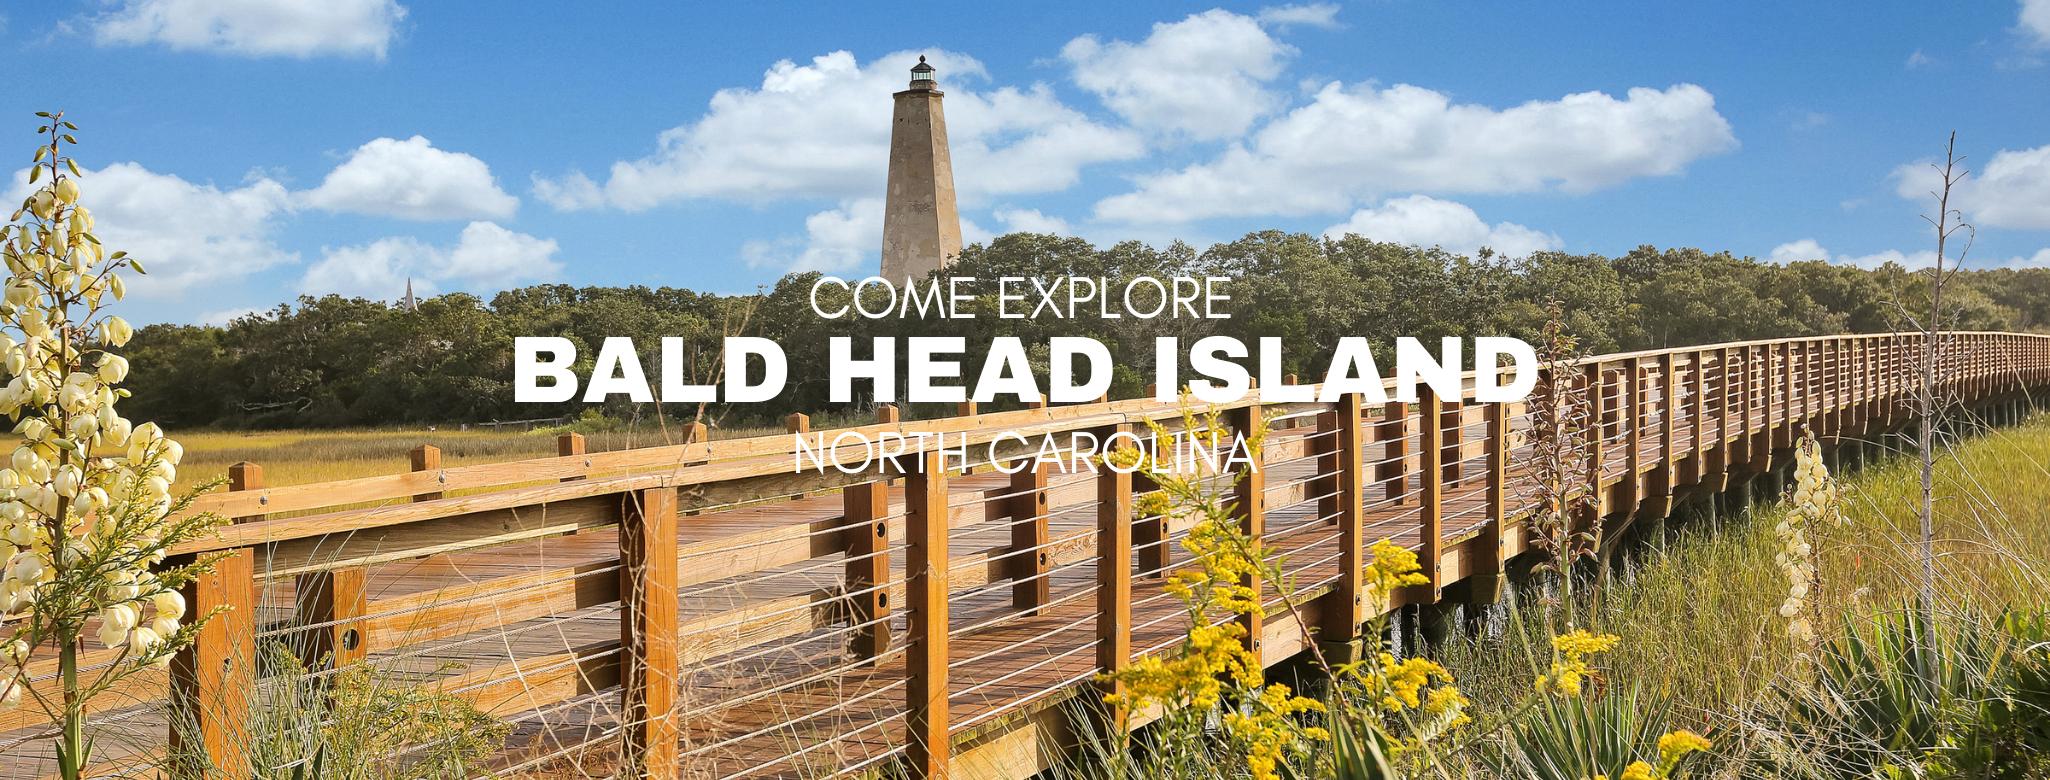 Come Explore Bald Head Island North Carolina